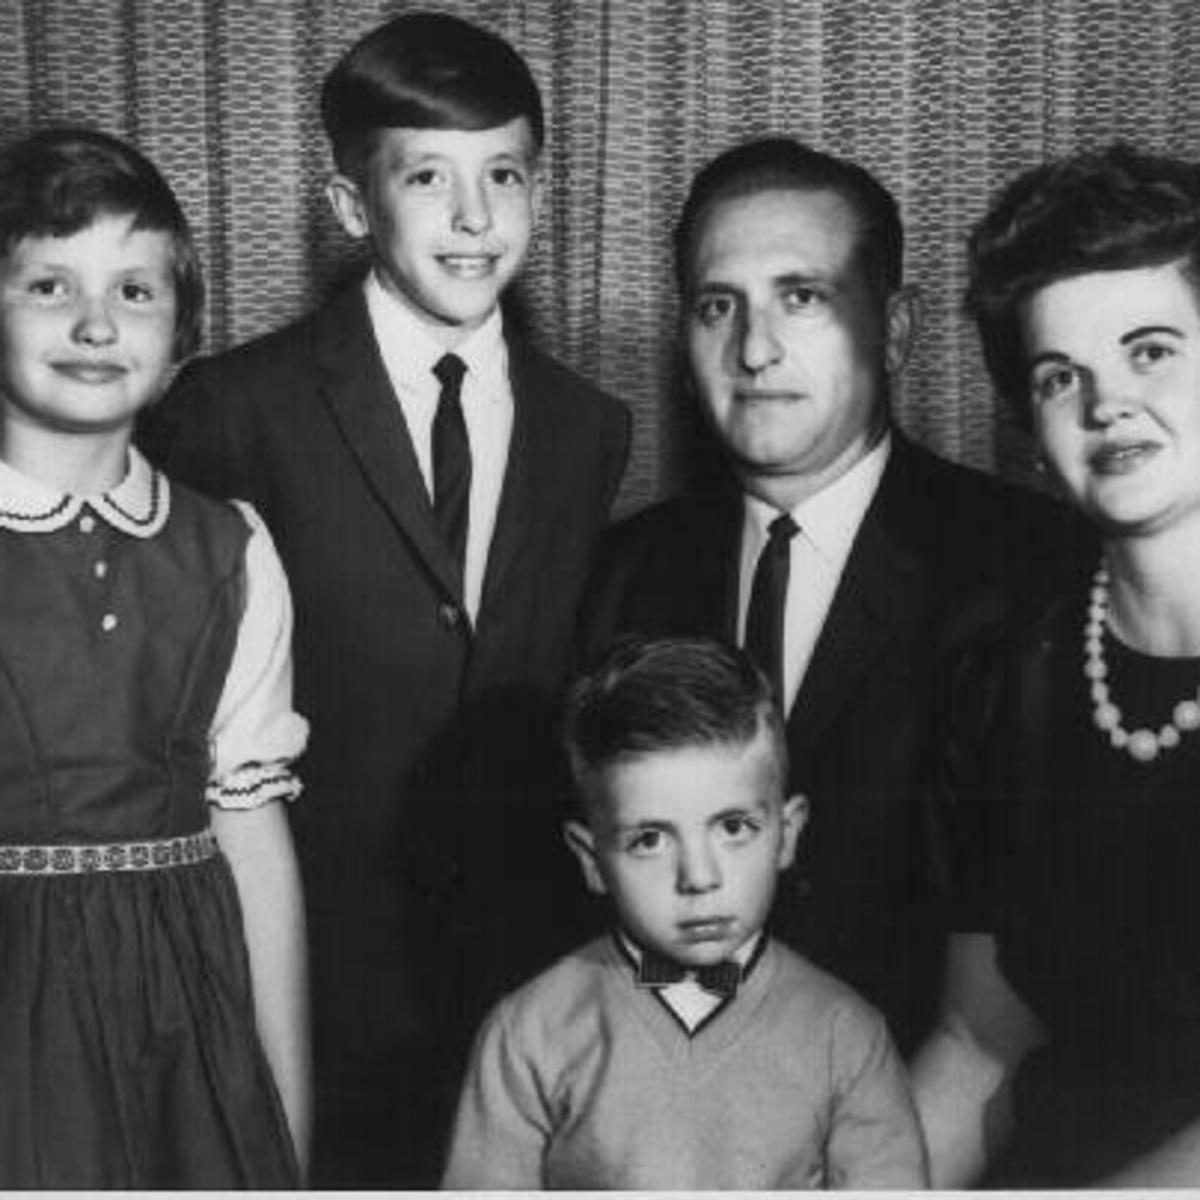 Keluarga Monson muda yang terdiri dari Ann, Tom, Clark, Thomas S., dan Frances Monson di tahun 1960-an.